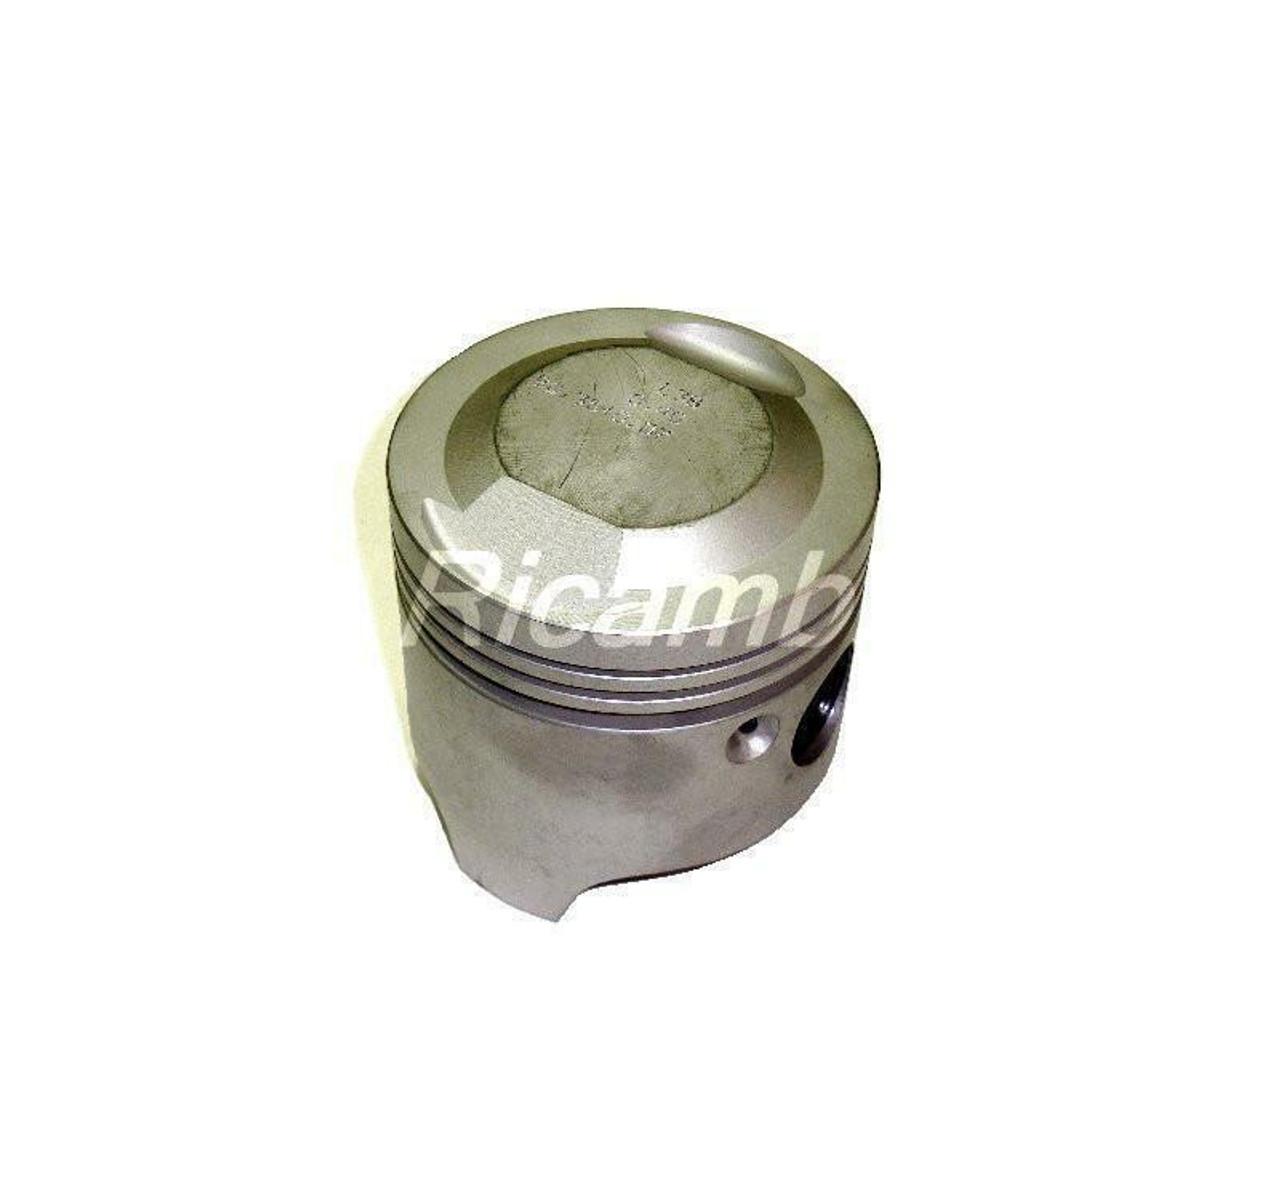 Piston Set - 1438cc - 9.4:1 Compression Ratio